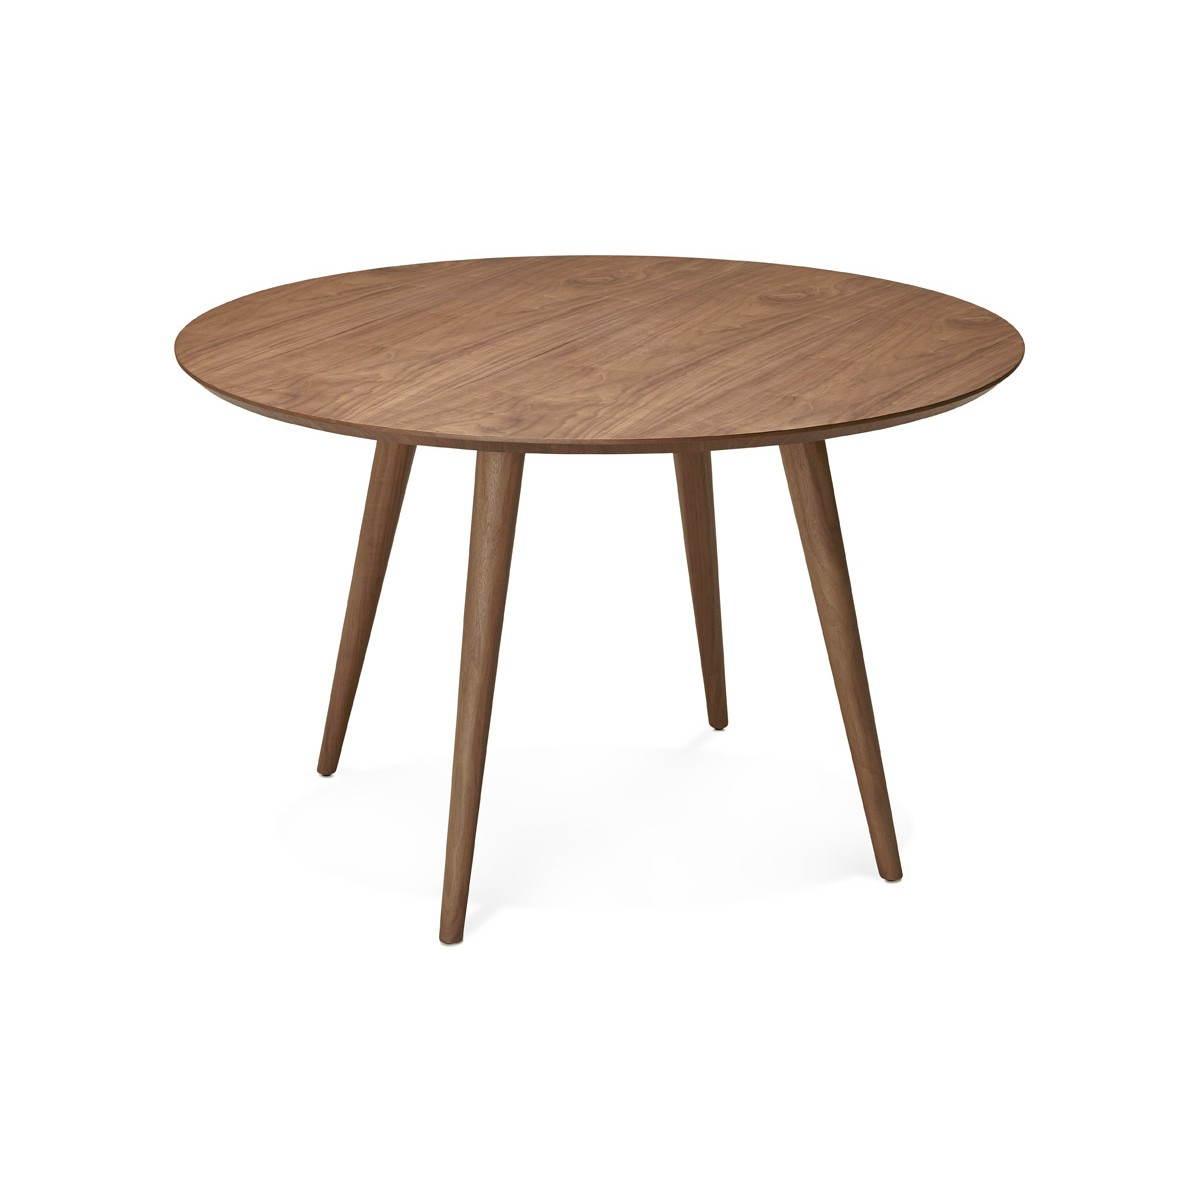 round dining table vintage style scandinavian sofia o 120 cm wood walnut amp story 3994